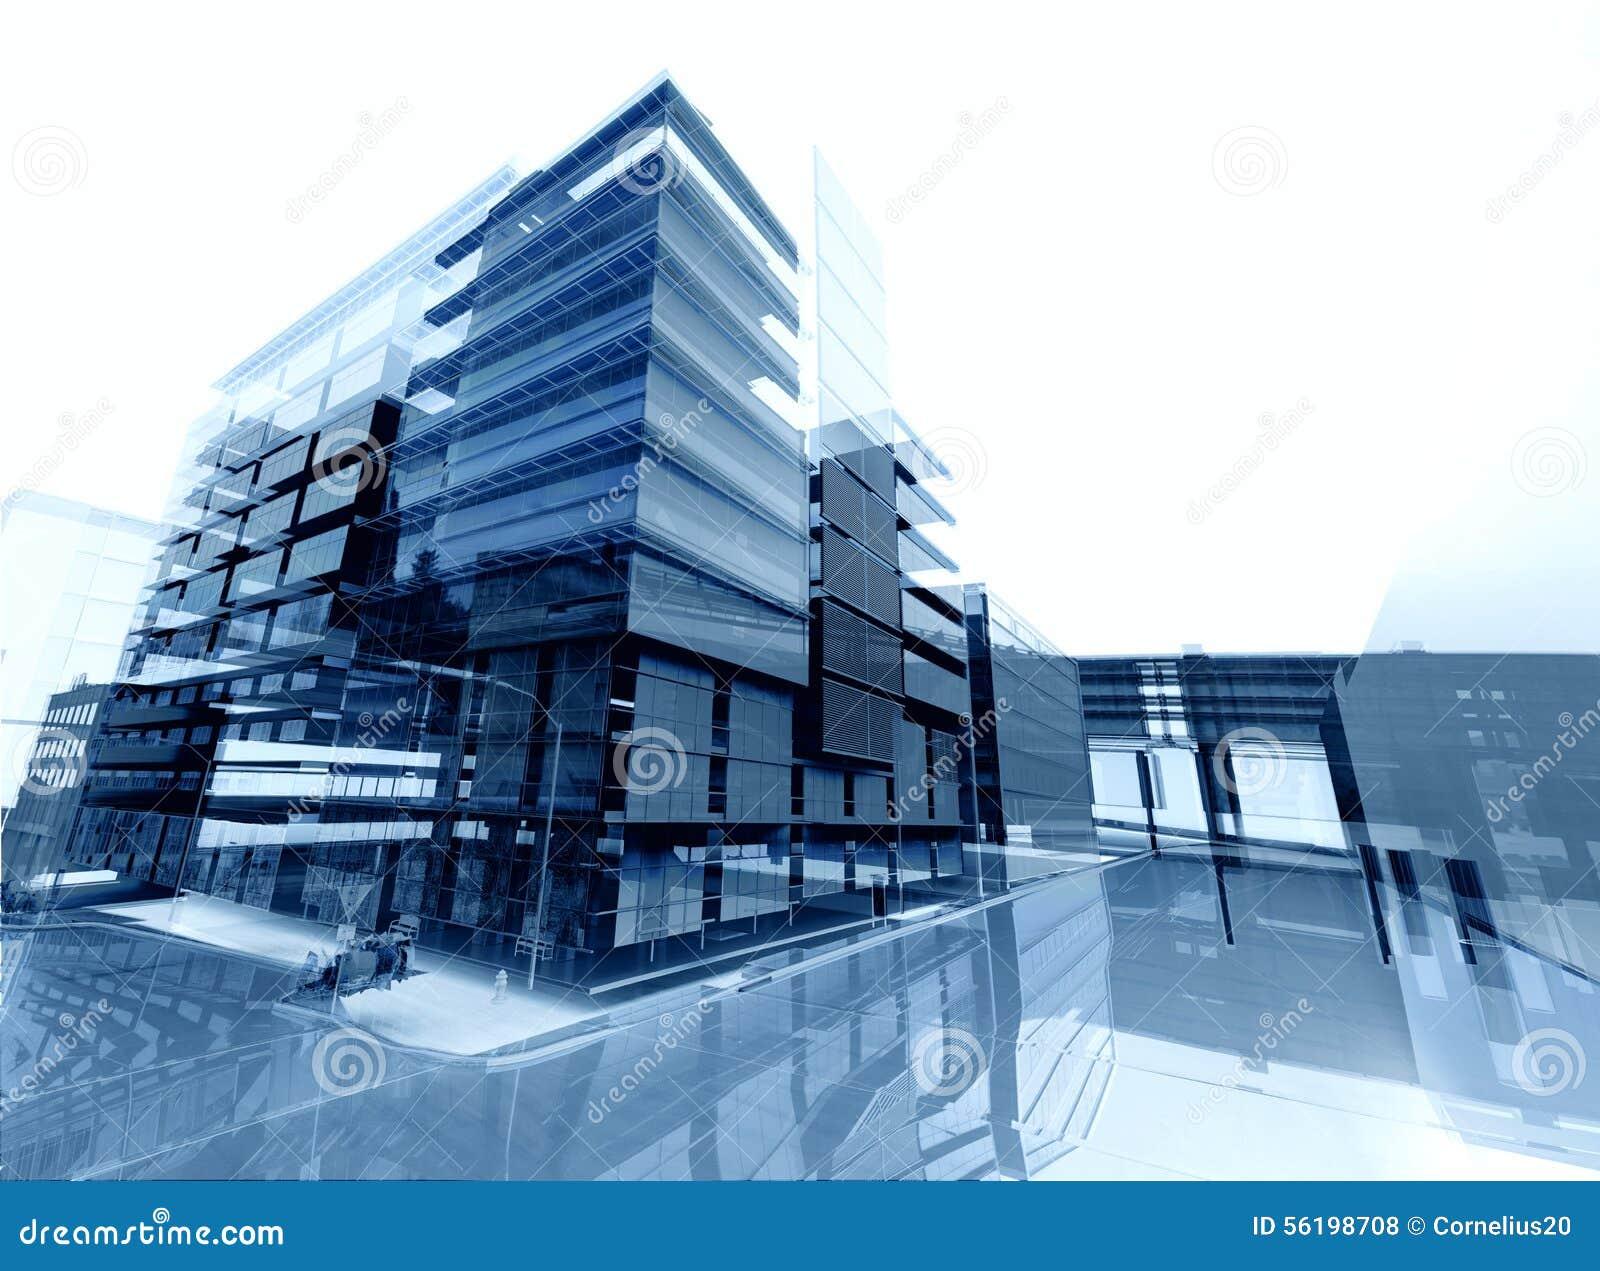 De samenvatting van de architectuur